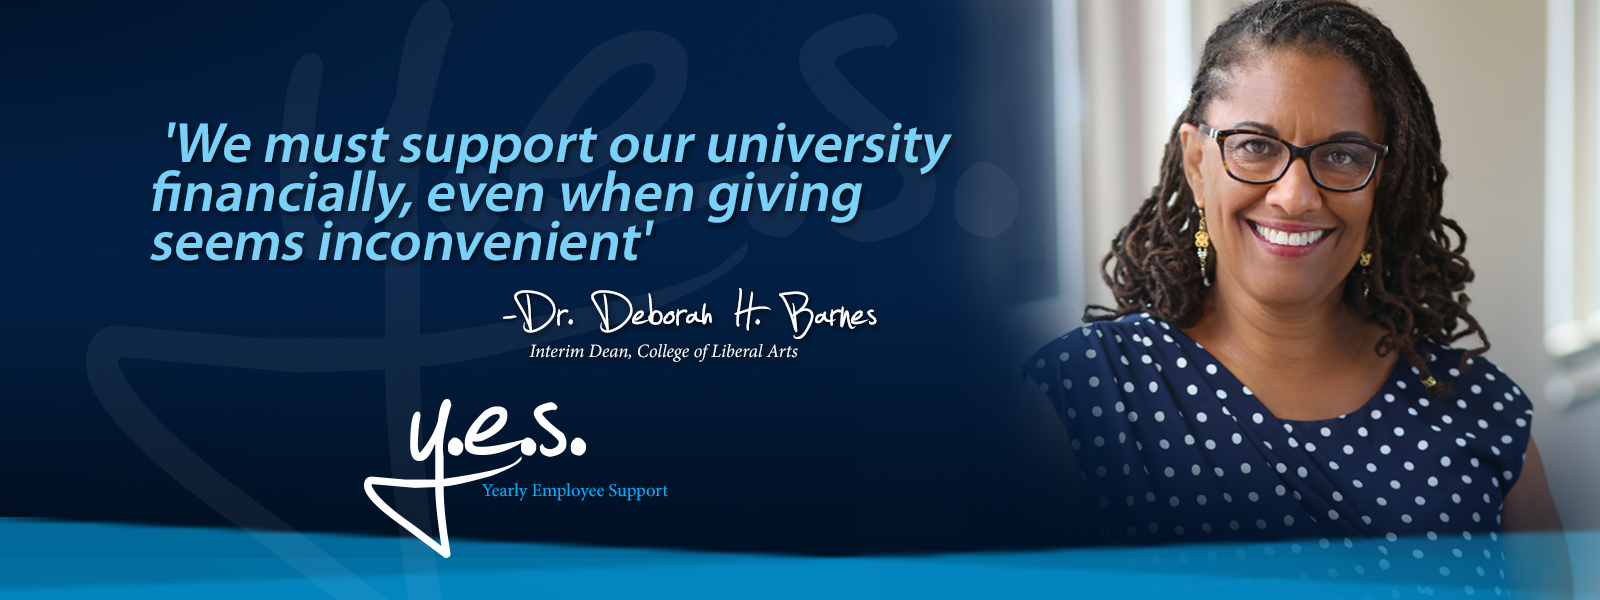 yes campaign_Dr. Deborah H. Barnes2_1600x600